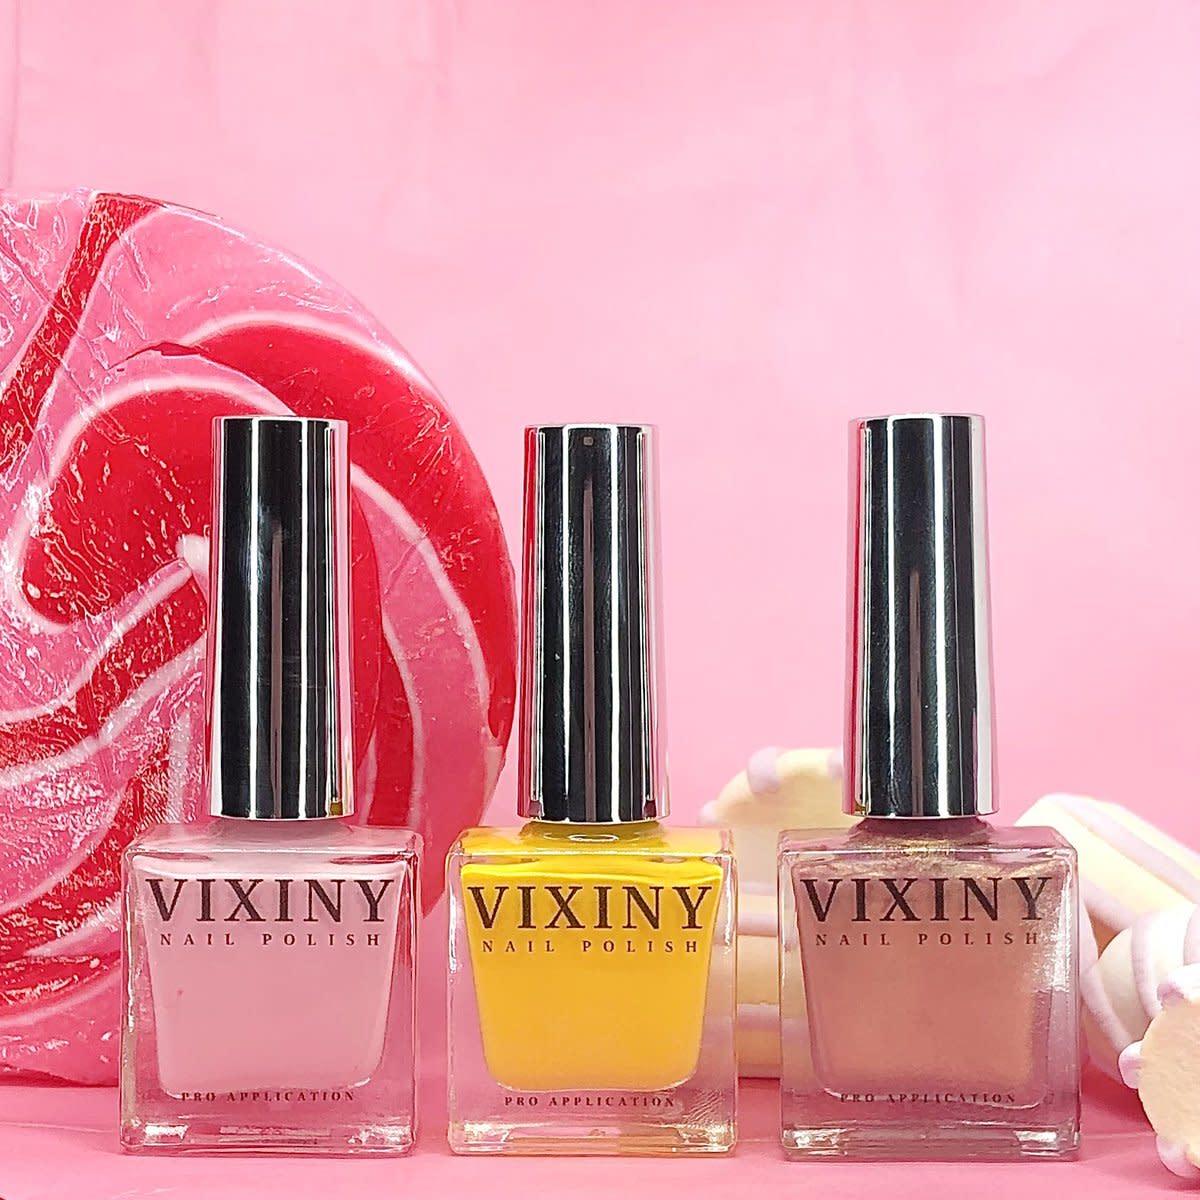 Bold and delicious- Vixiny